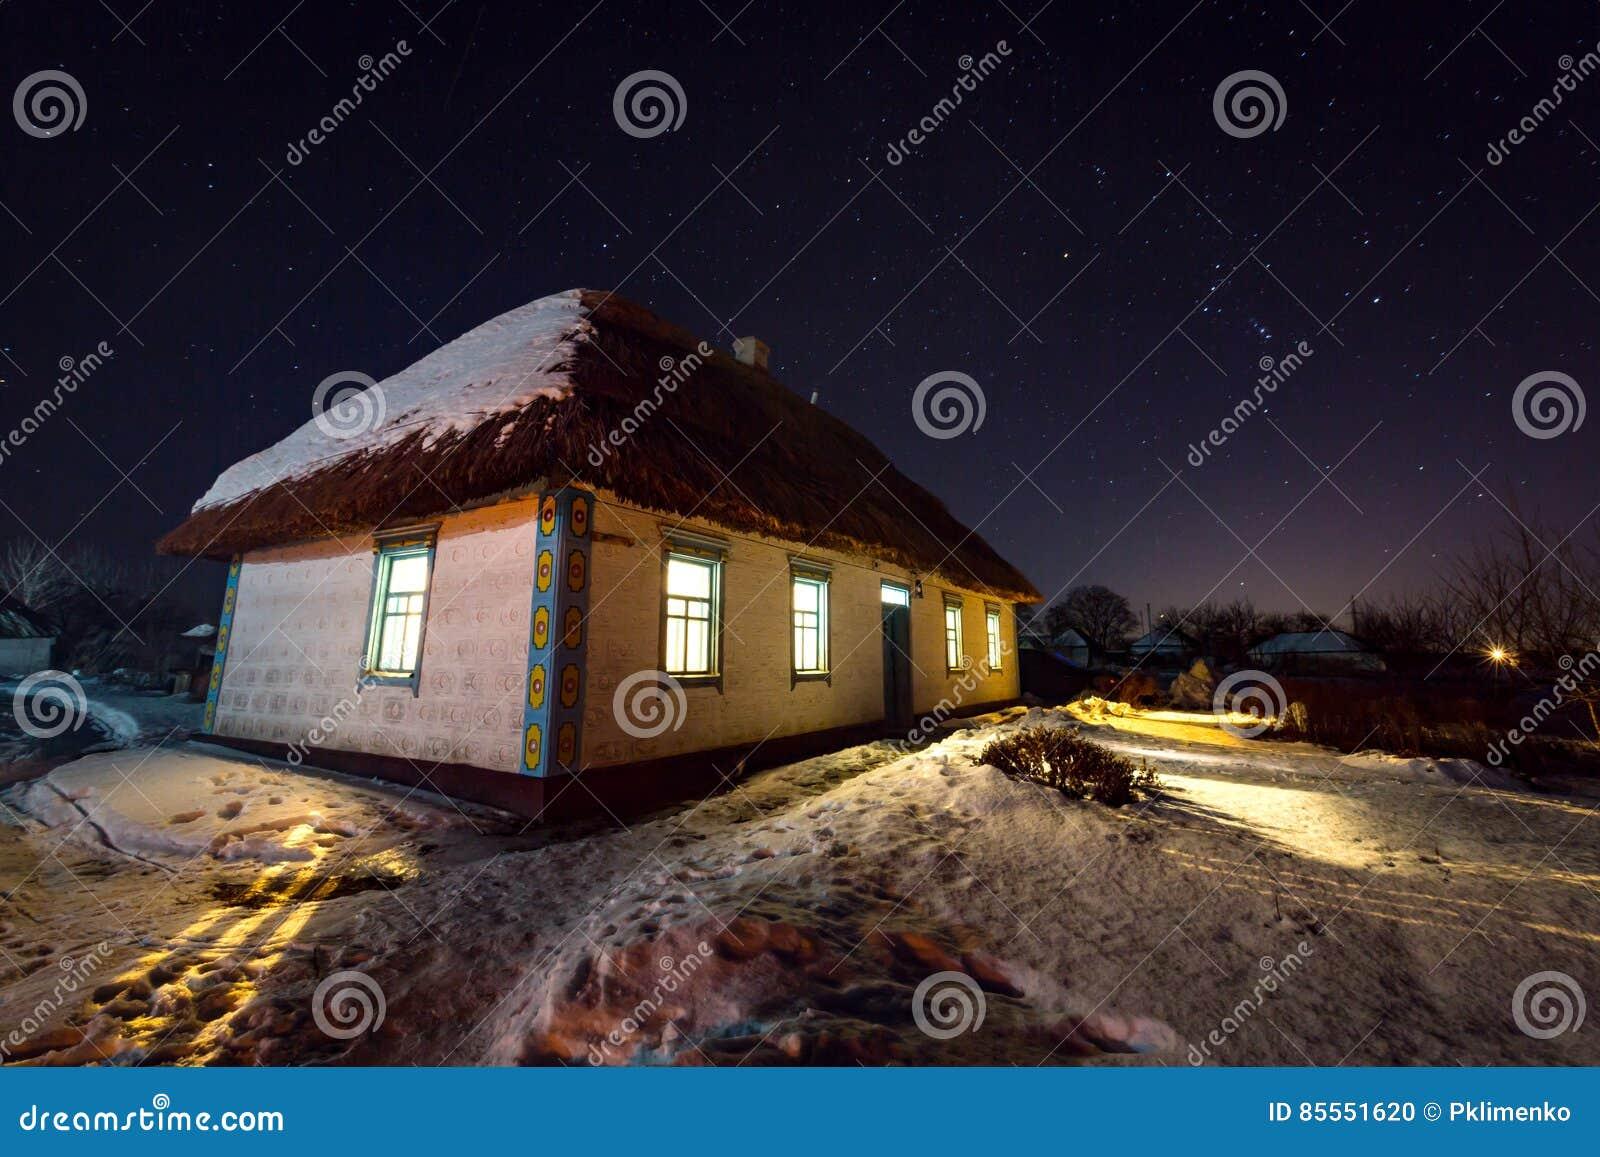 Nachtszene mit altem Haus